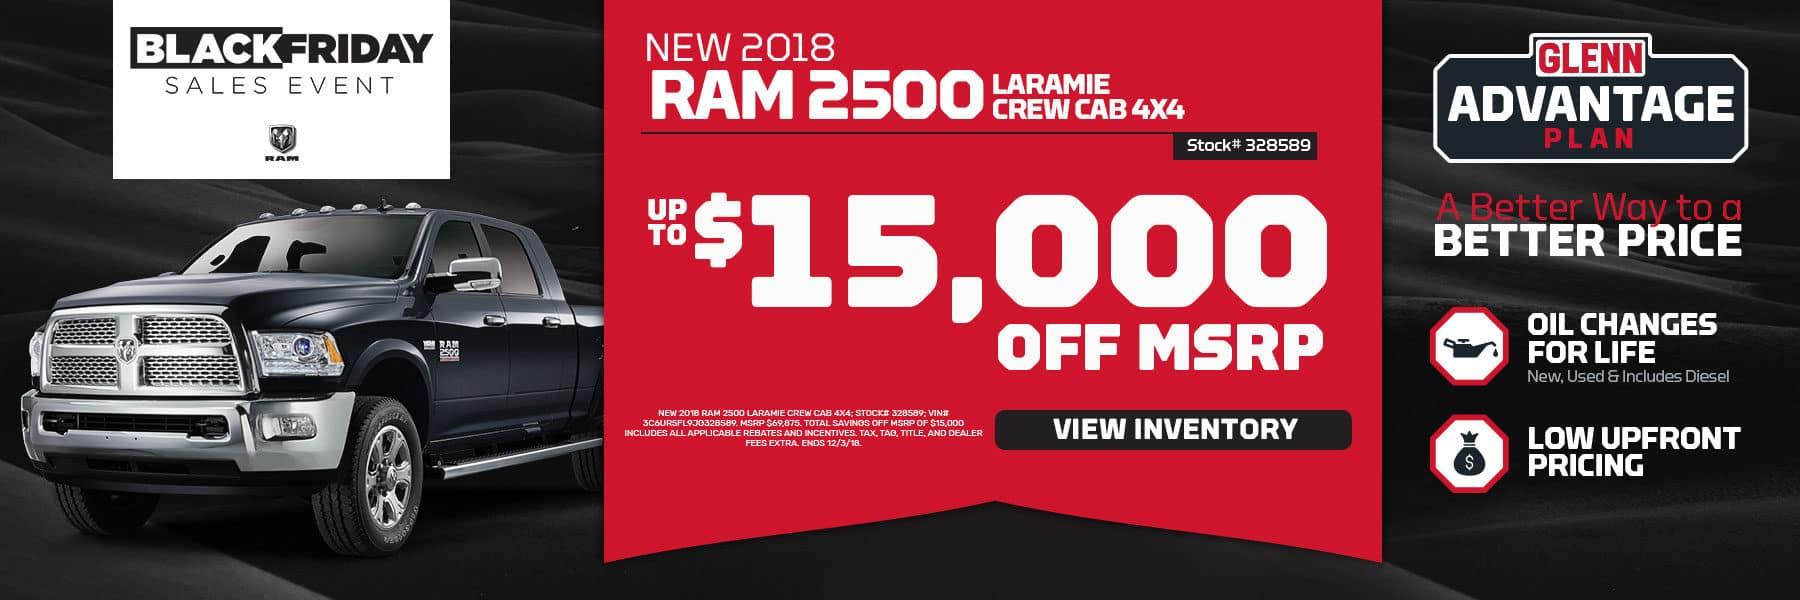 Black Friday Sale Ram 2500